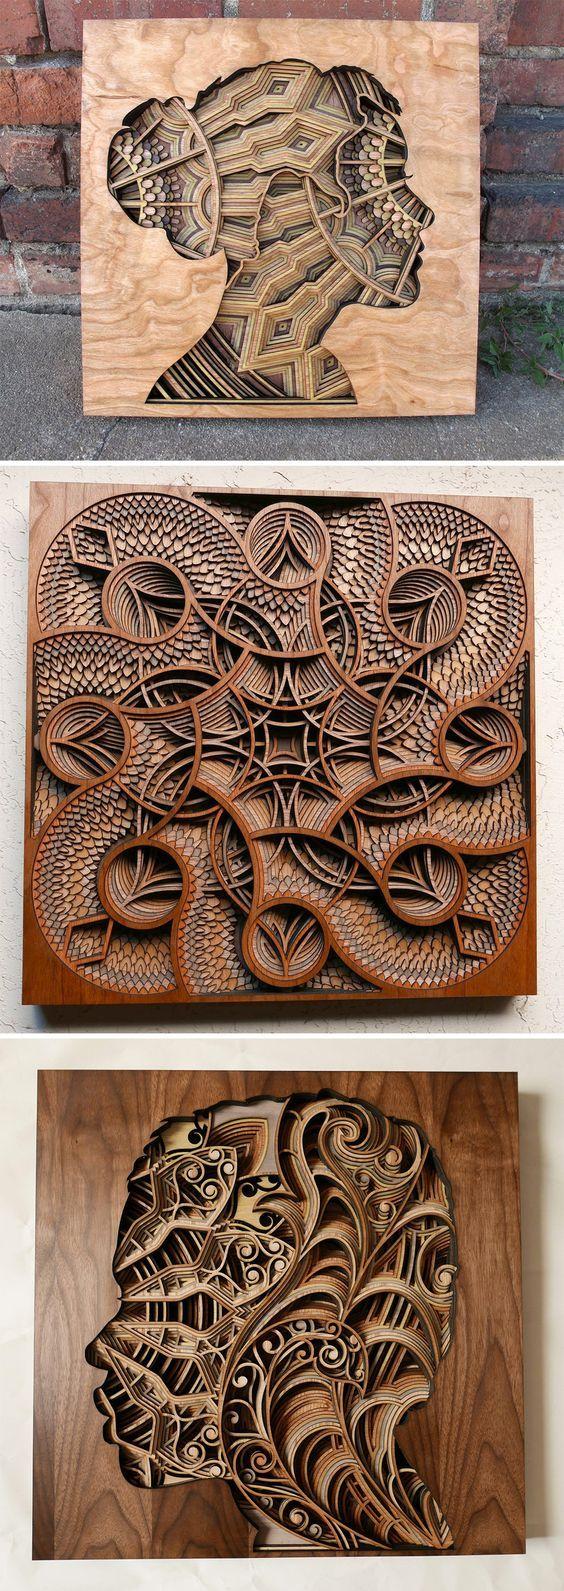 New Laser-Cut Wood Relief Sculptures by Gabriel Schama